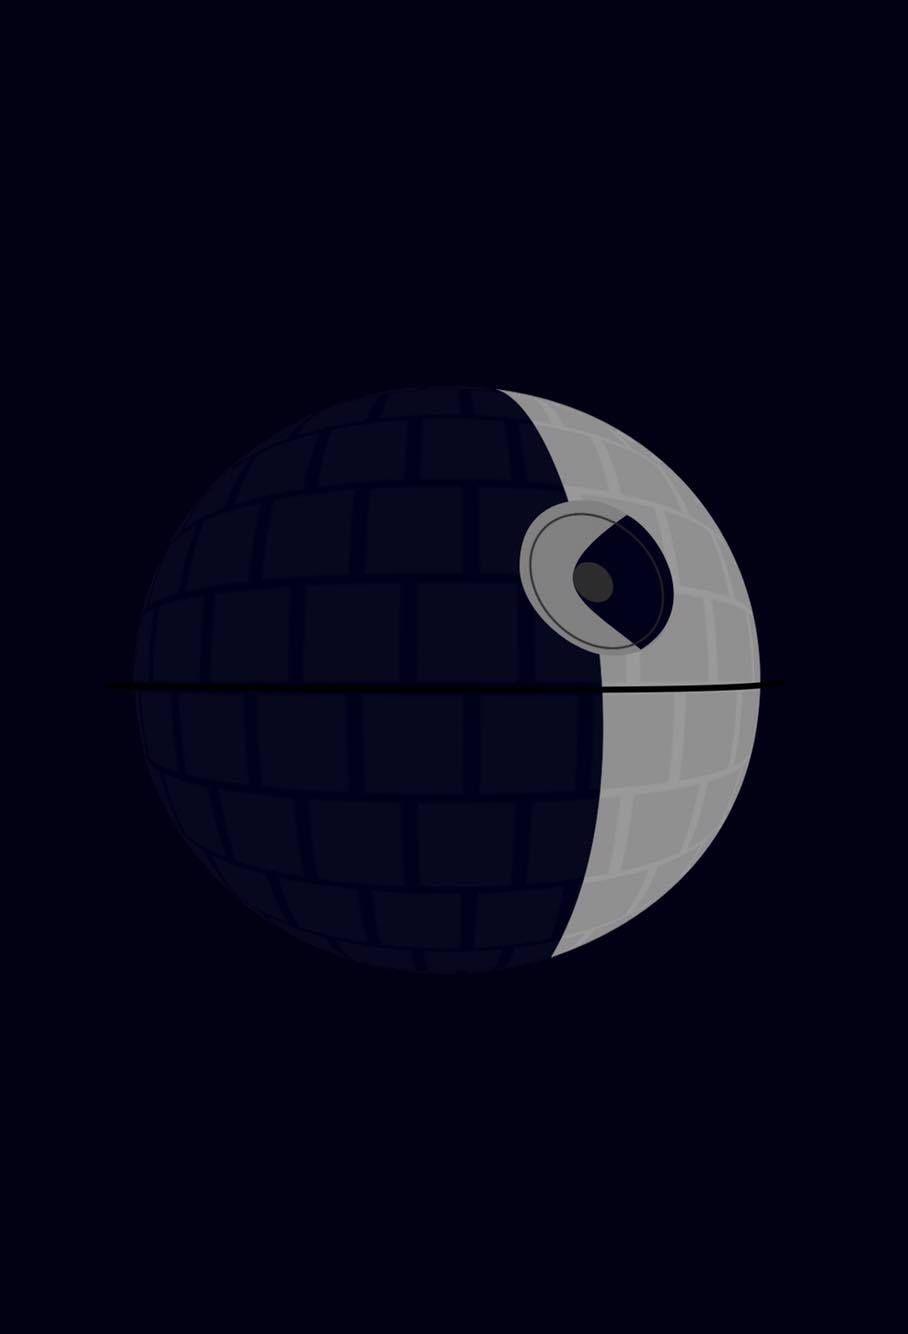 17 High Resolution Star Wars Wallpapers Hd Avec Images Fond Ecran Gratuit Fond Ecran Ecran